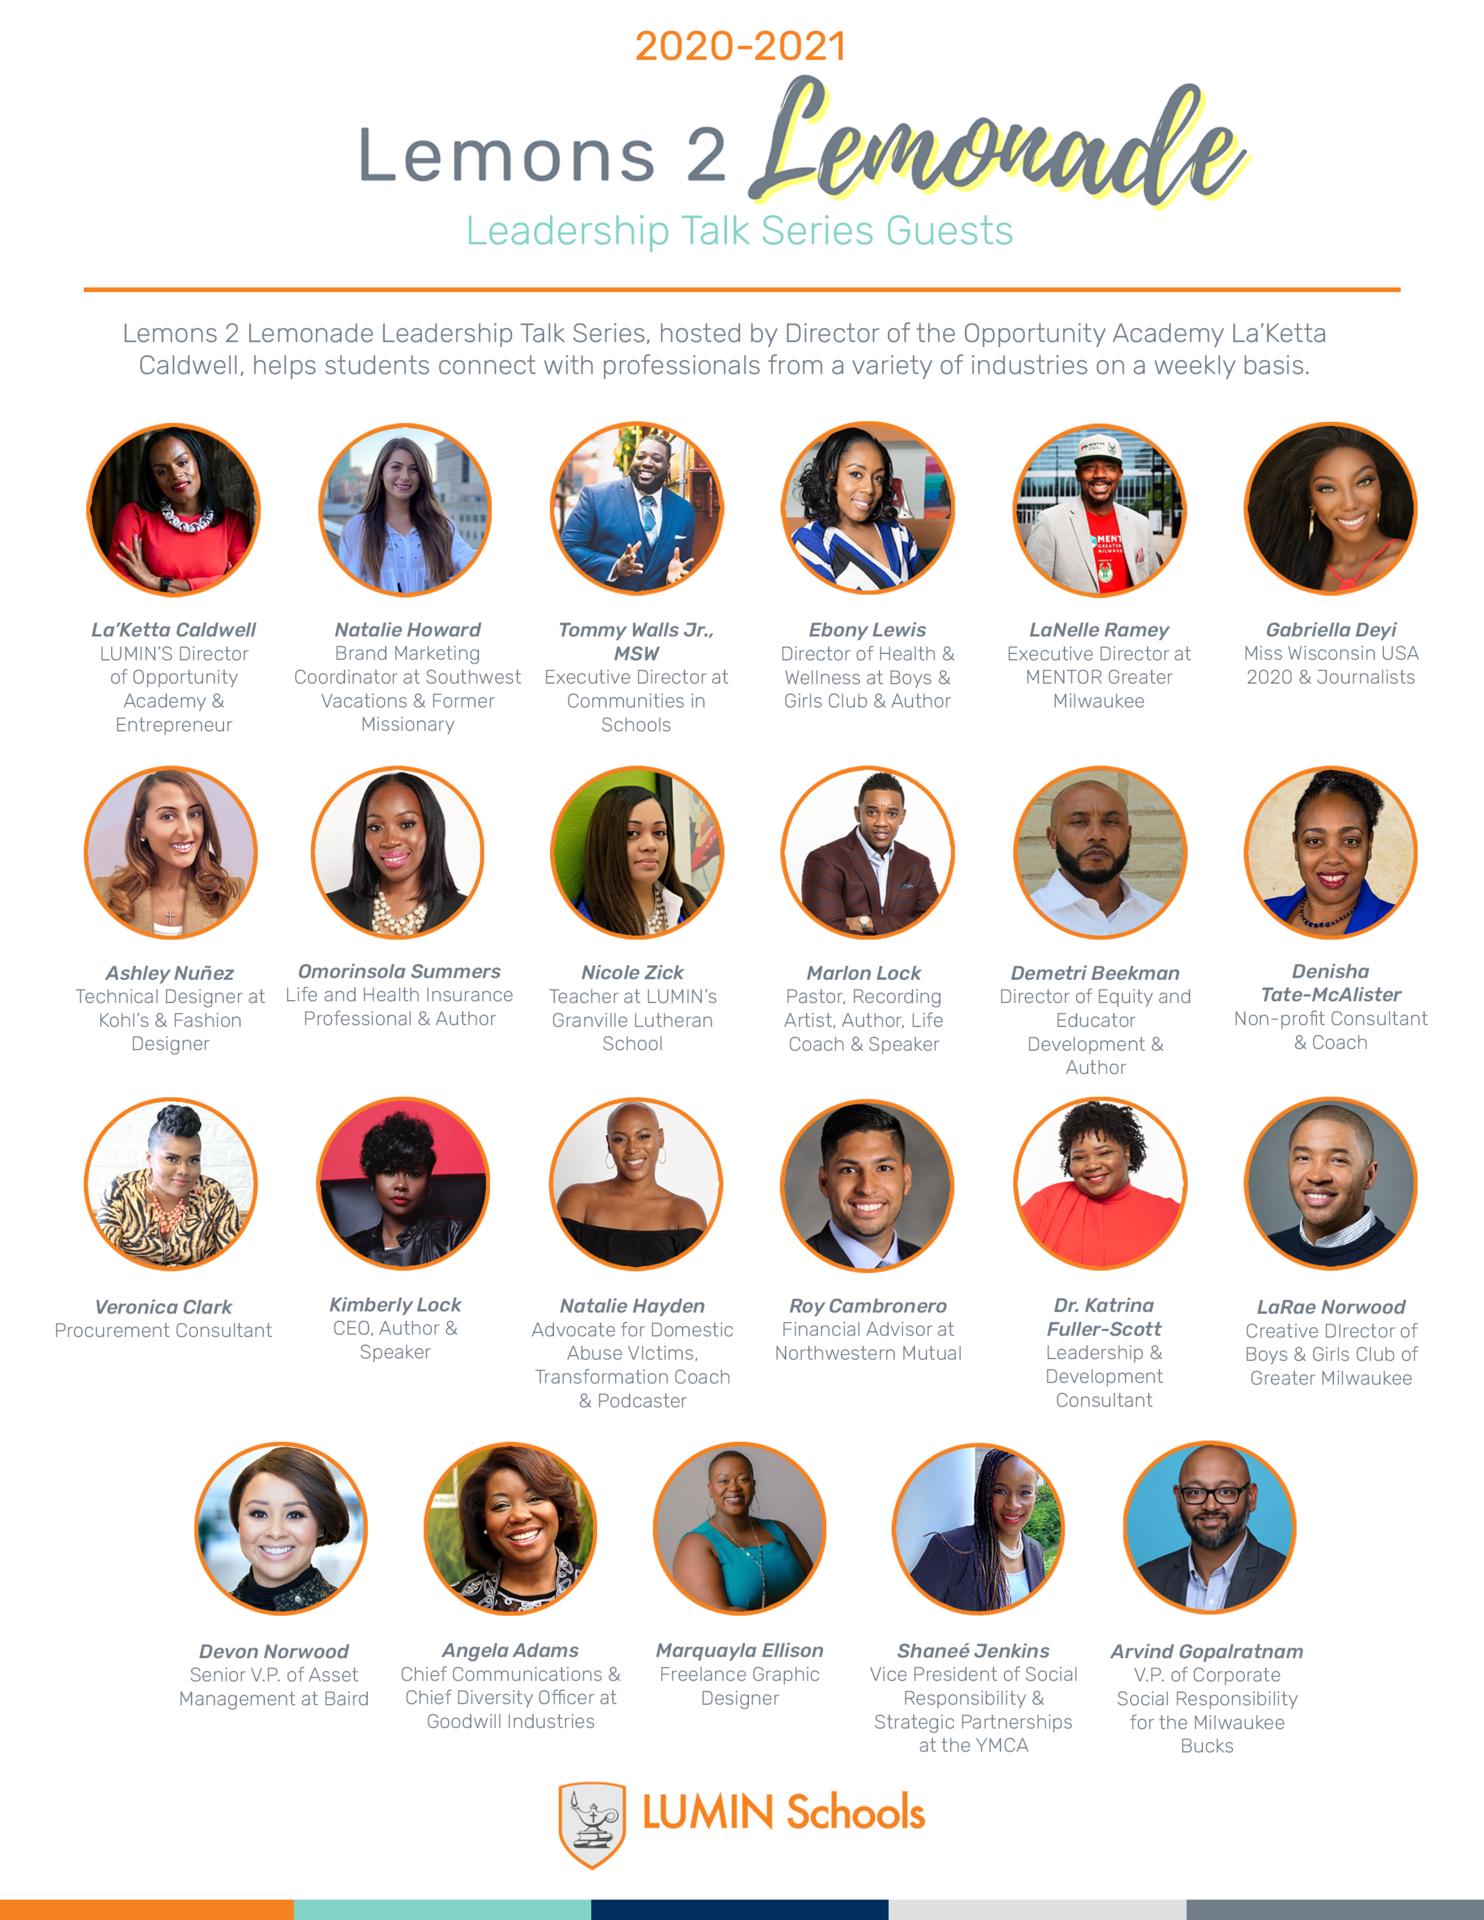 Lemons 2 Lemonade Leadership Series Guests 2020-2021